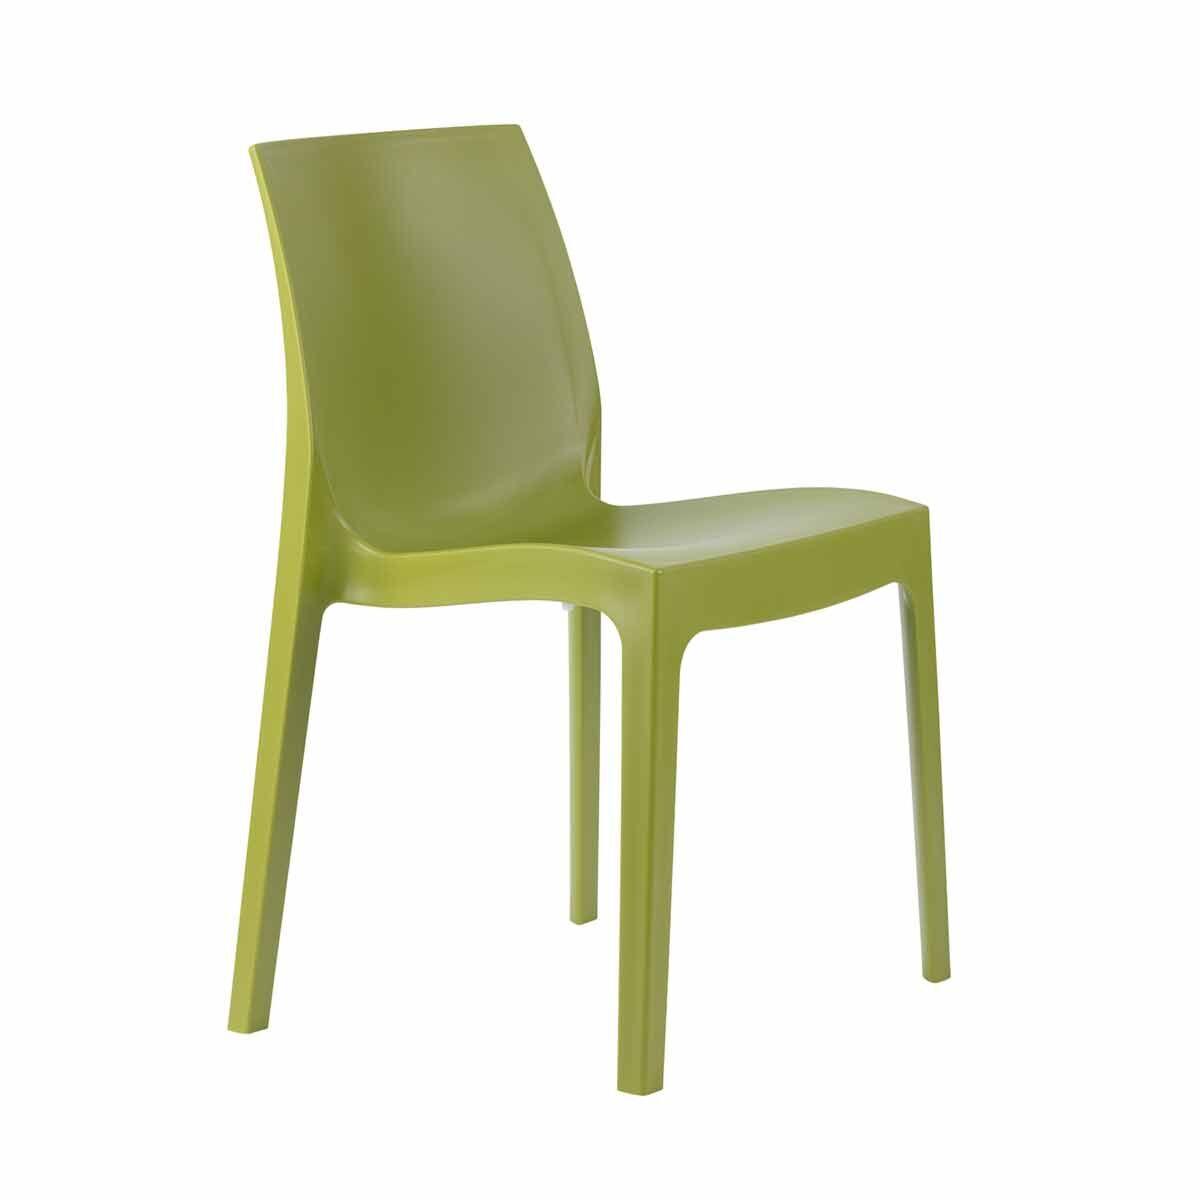 Tabilo Strata Polypropylene Stacking Chair Green